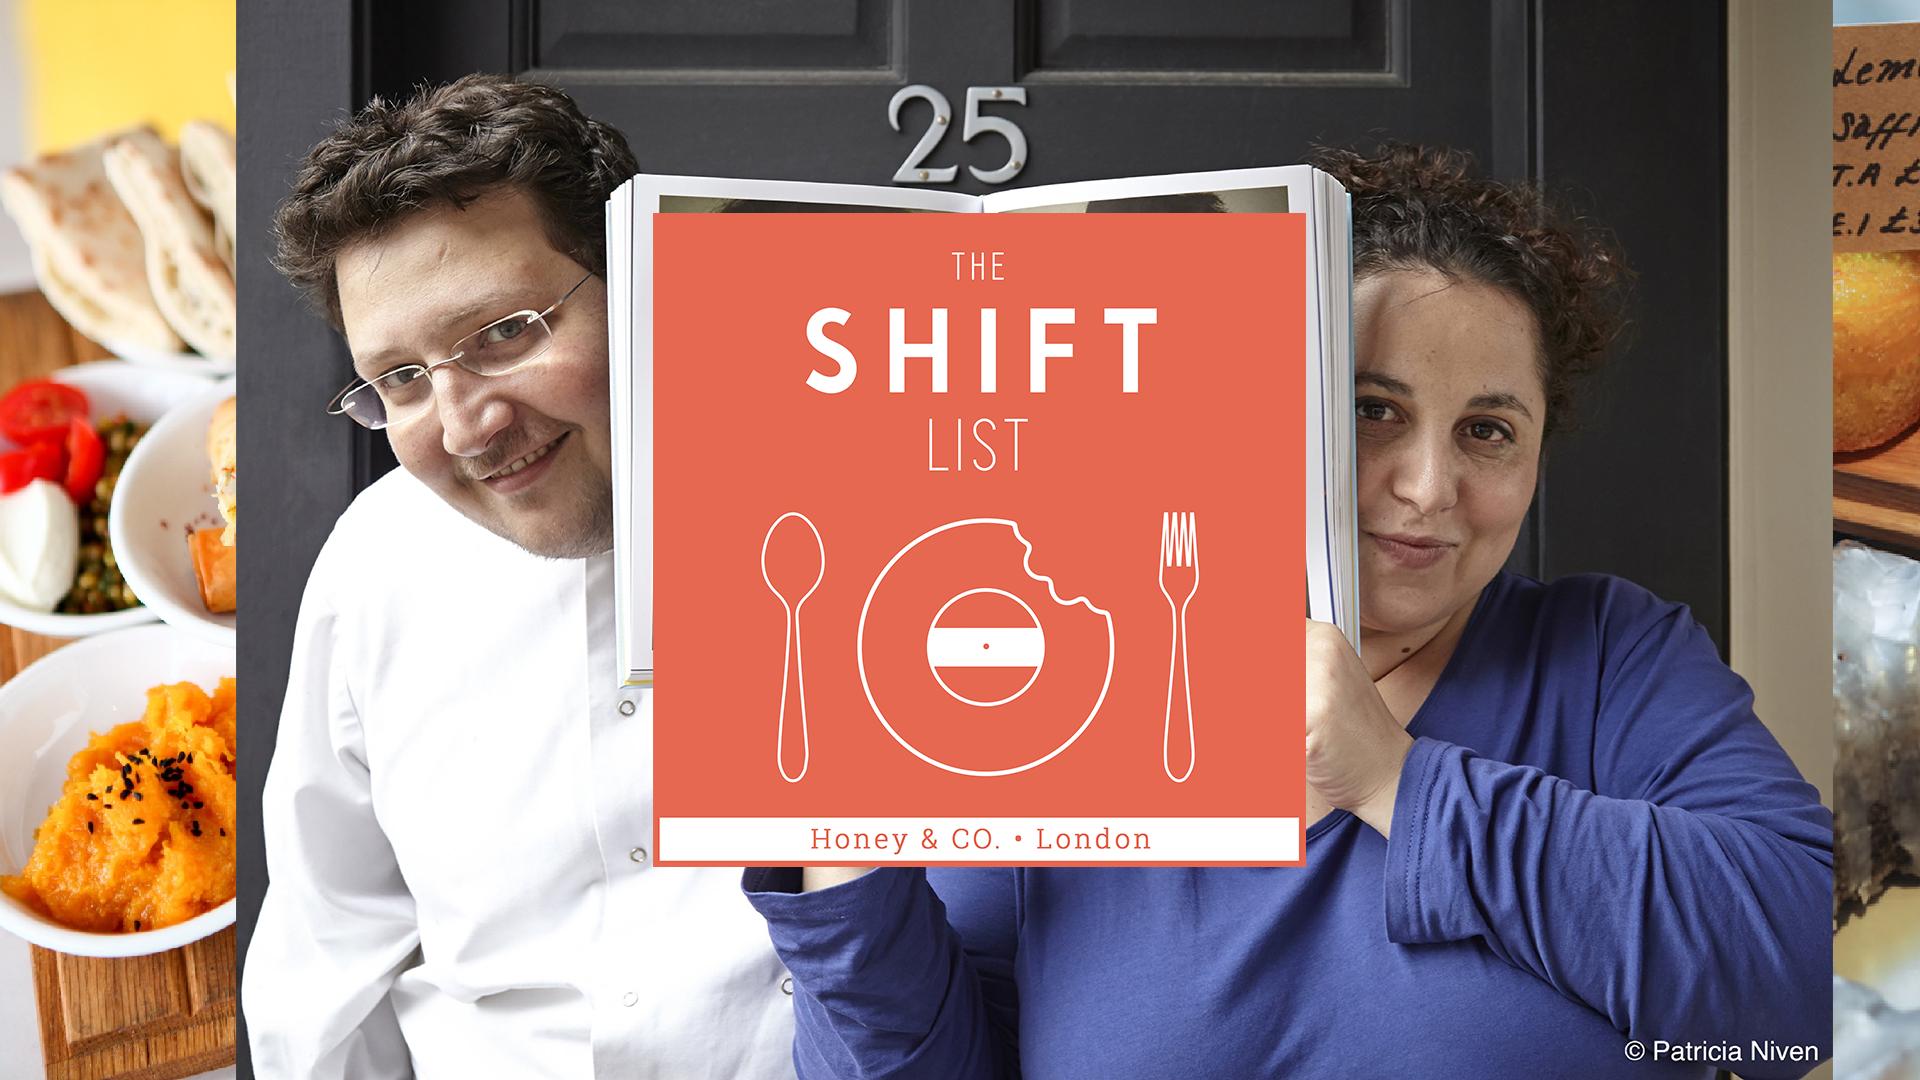 The Shift List - Honey & Co, London